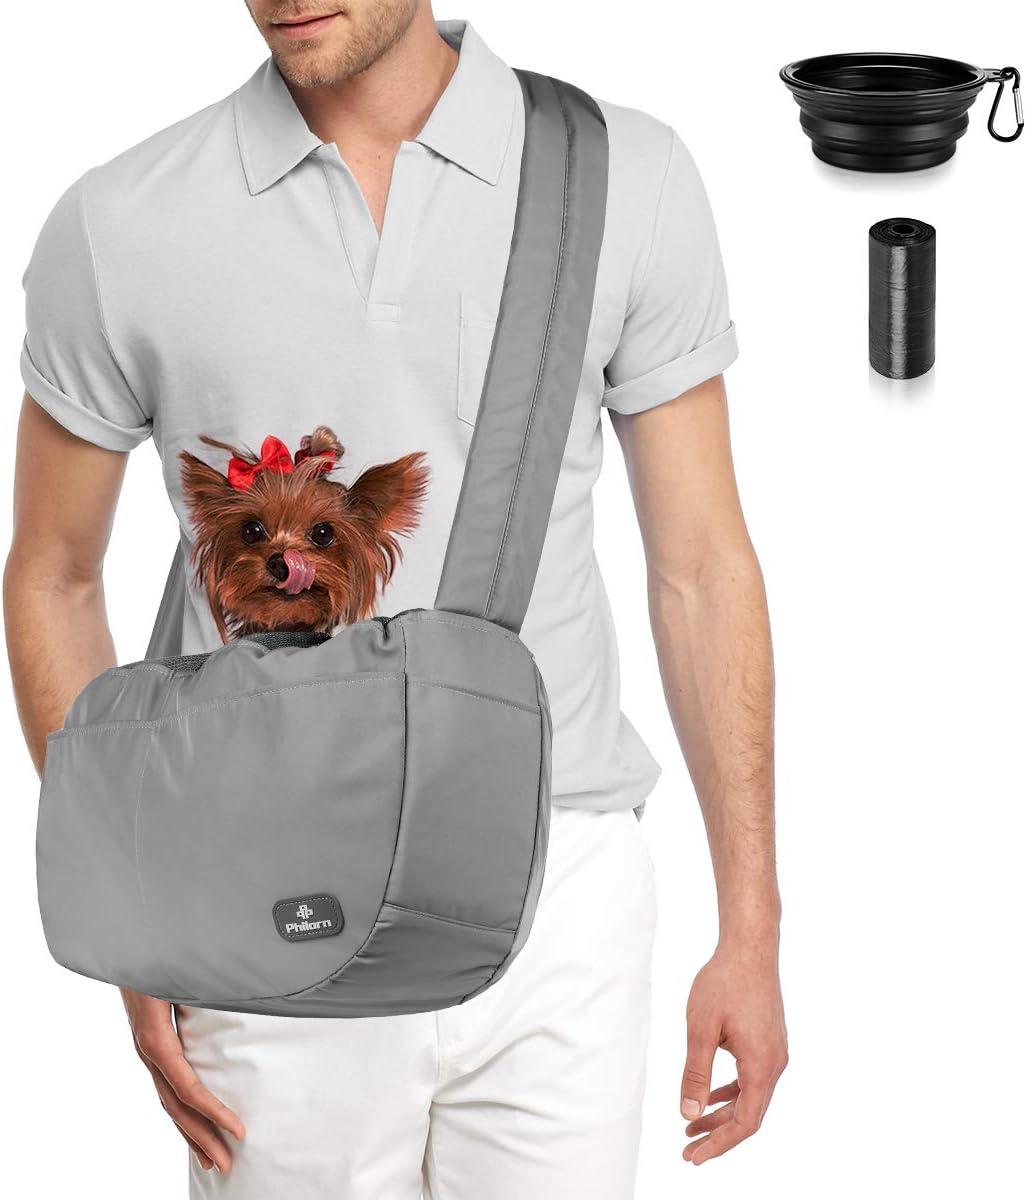 PHILORN Bolsa Bandolera de Transporte para Mascota Manos Libres, Transportín Bolsa Portador de Viaje para Mascota, Bolso de Hombro Acolchada Ajustable para Perro Gato de Hasta 30lbs - Muchos Bolsillos